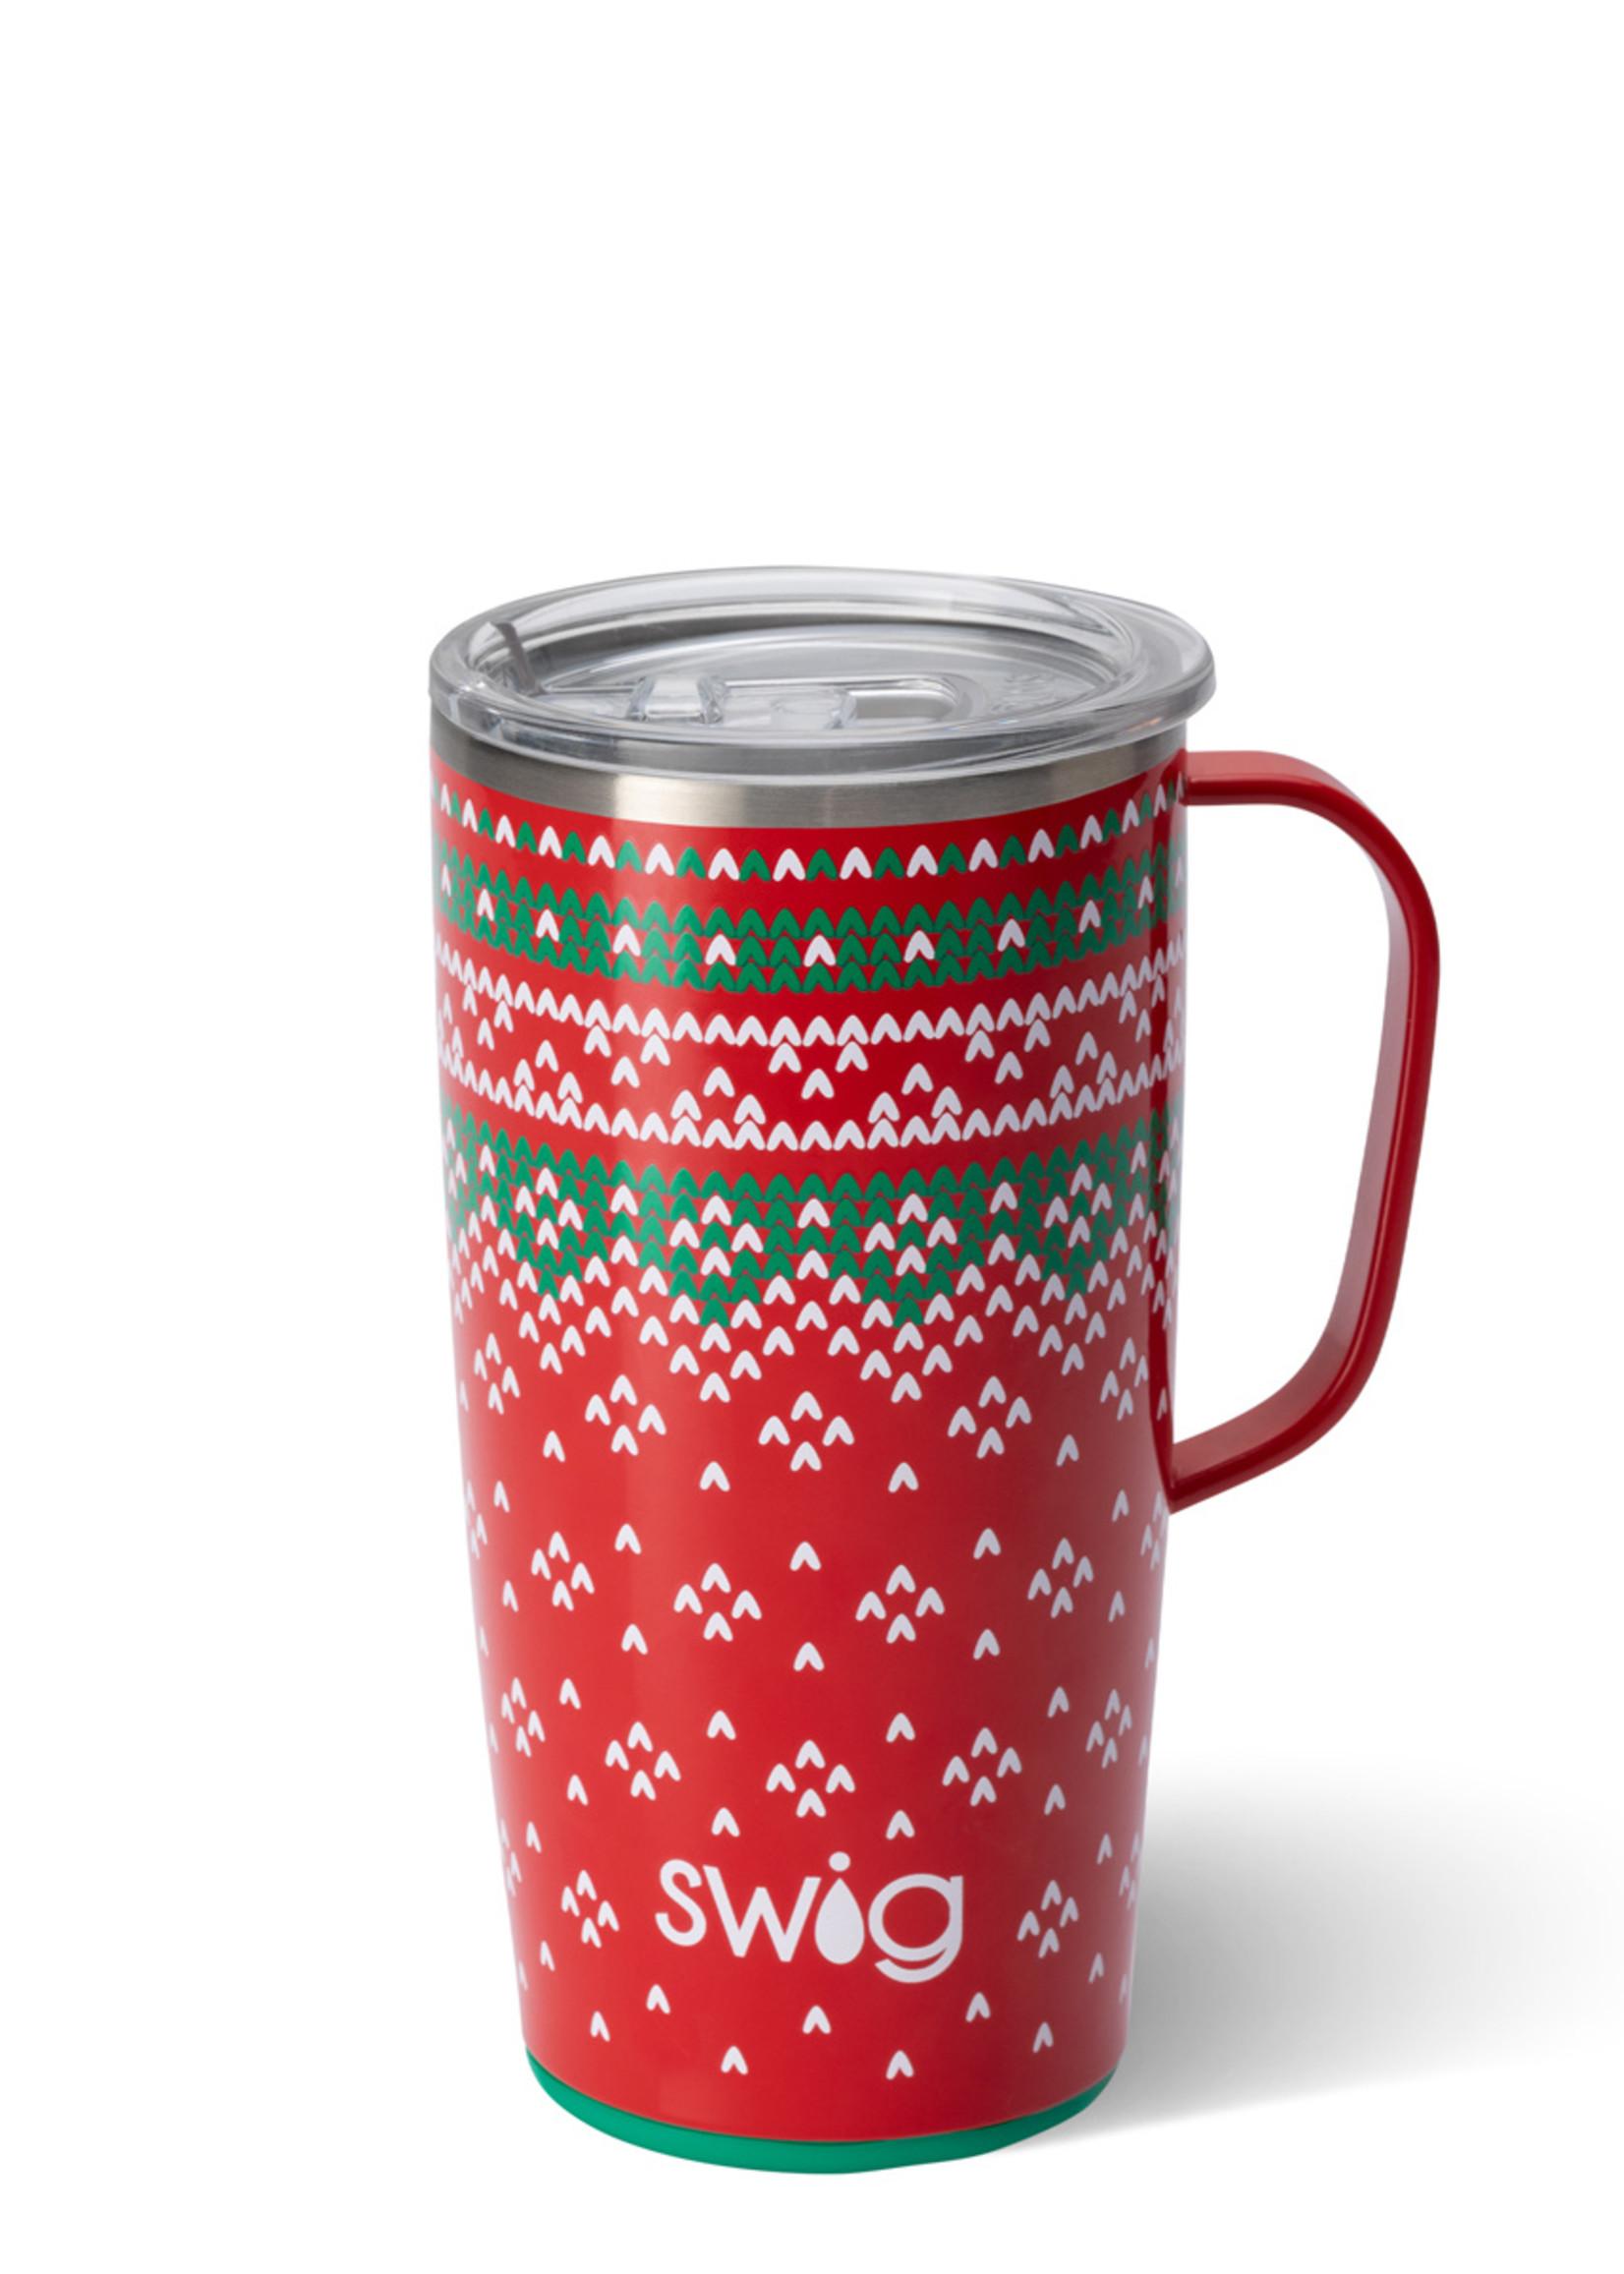 Swig Sweater Weather Mug 22 oz